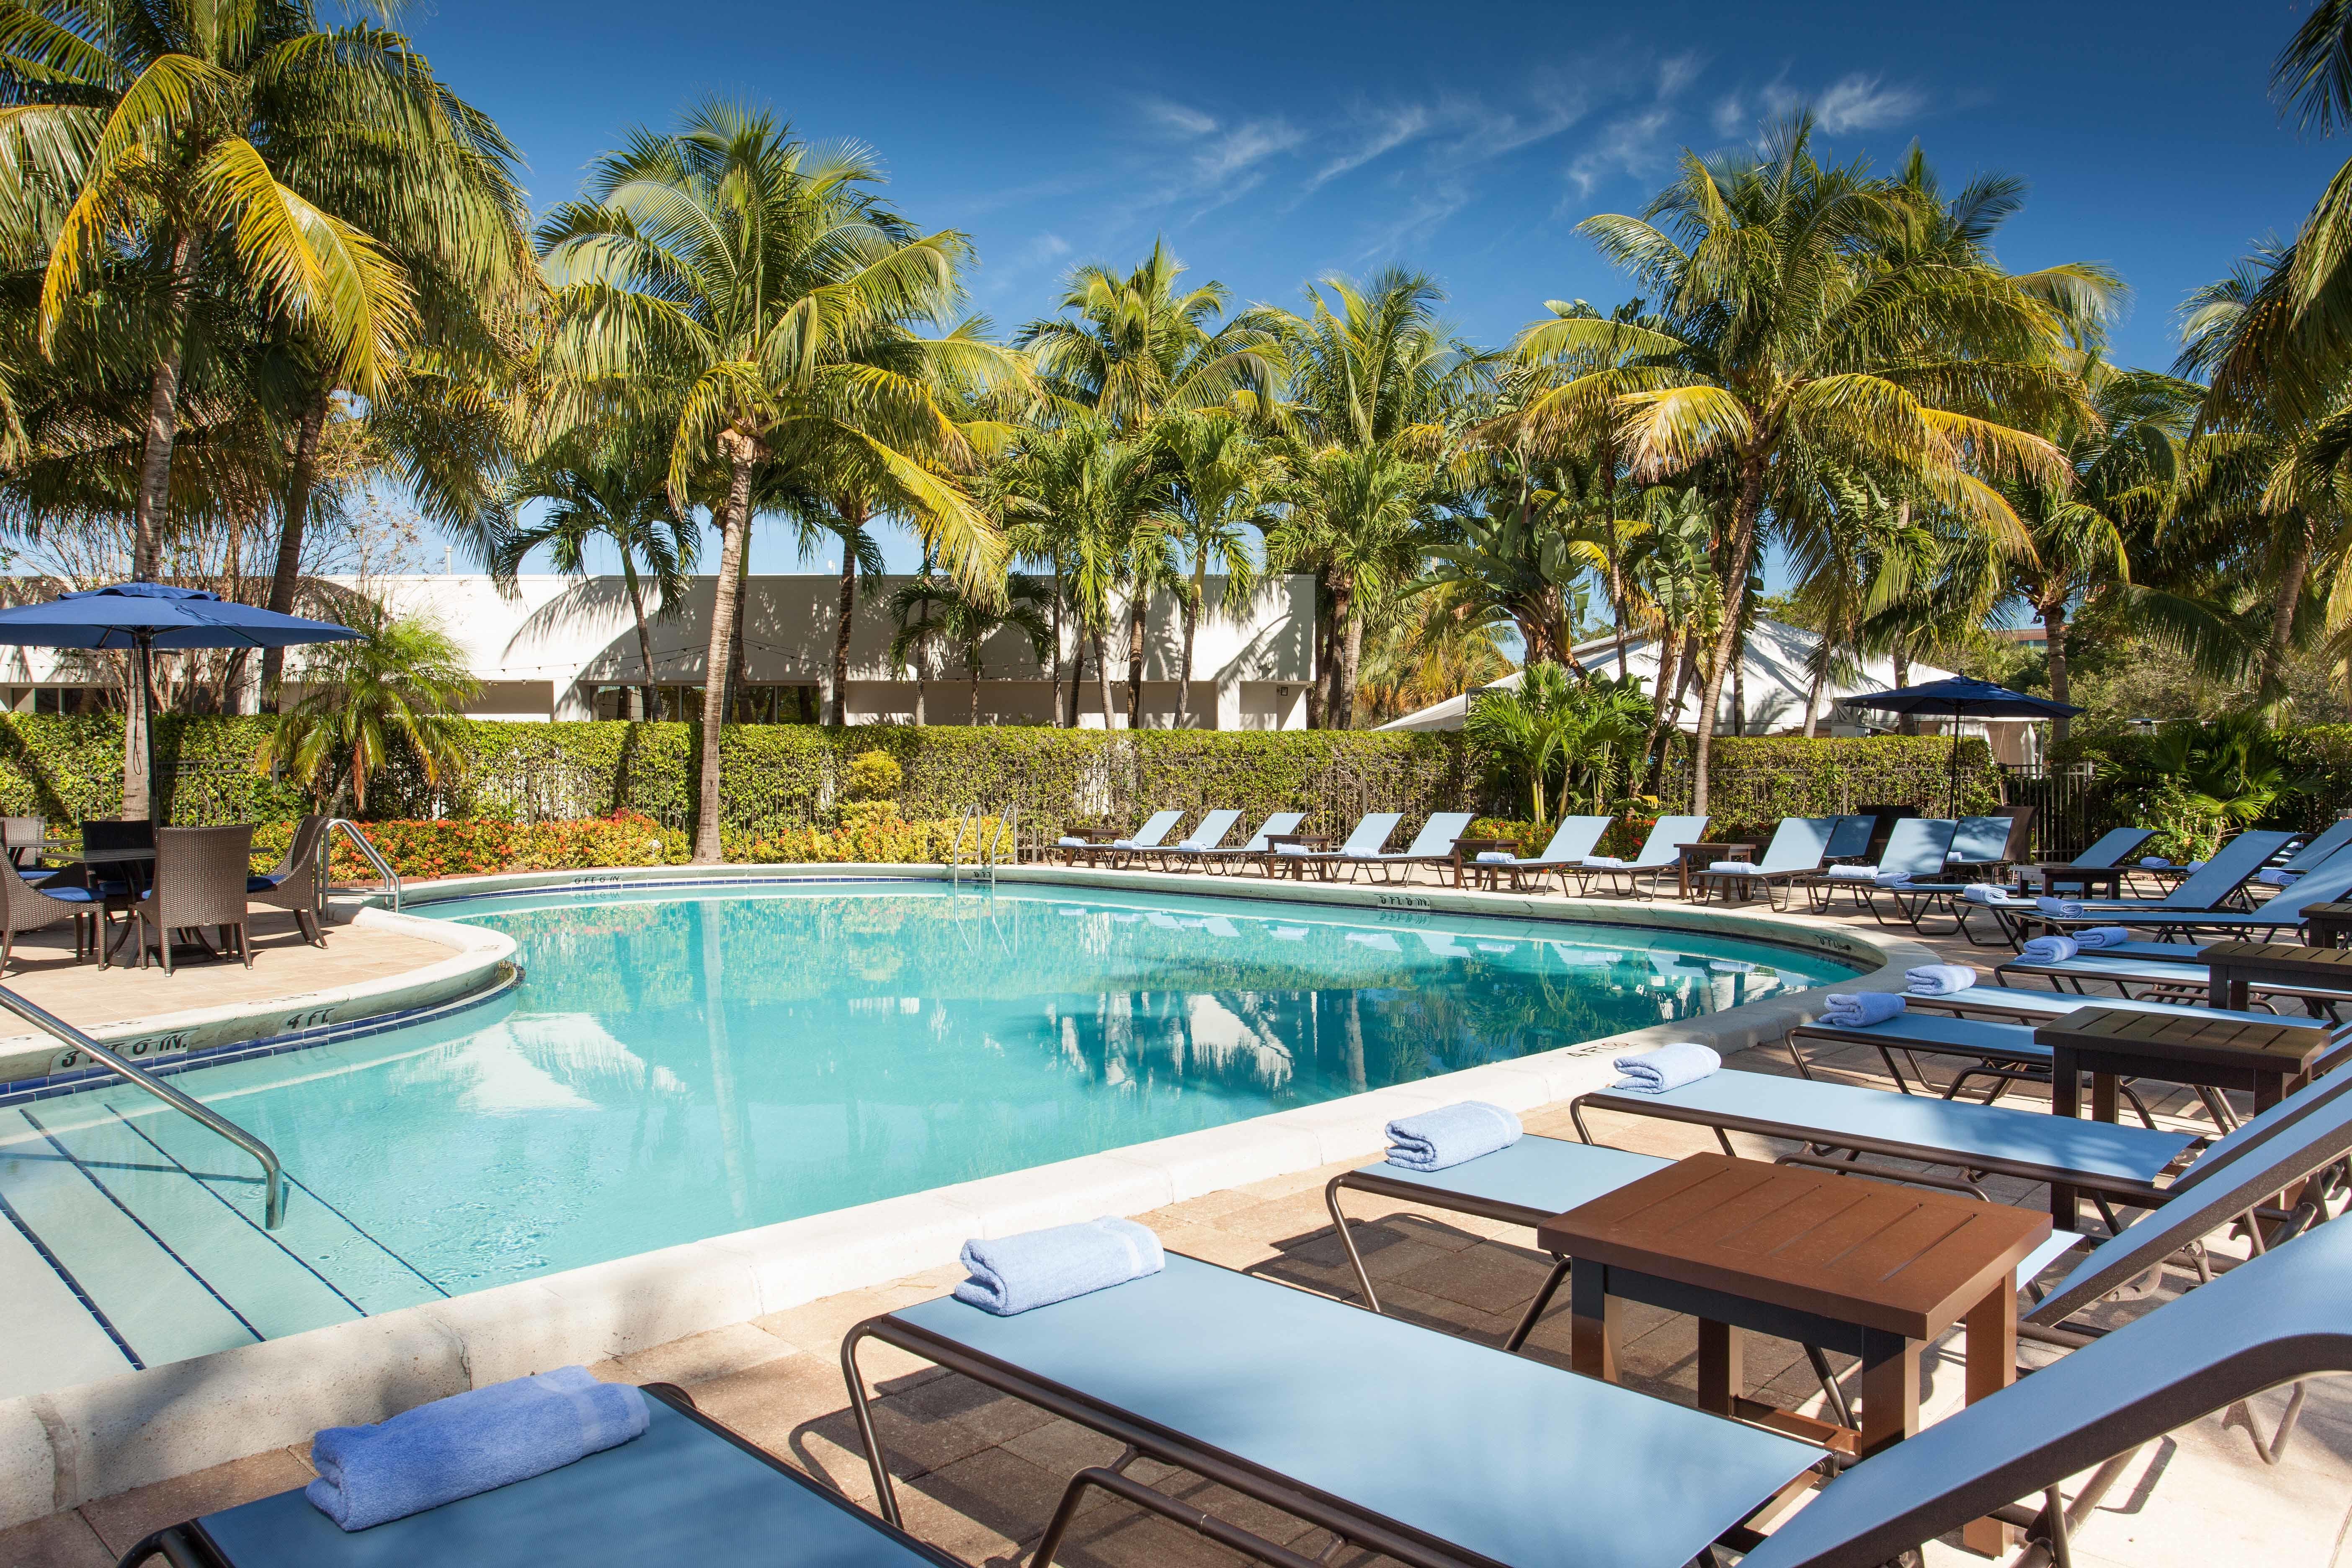 West palm beach fl swingers Club Hedonism - HTML Site Disclaimer